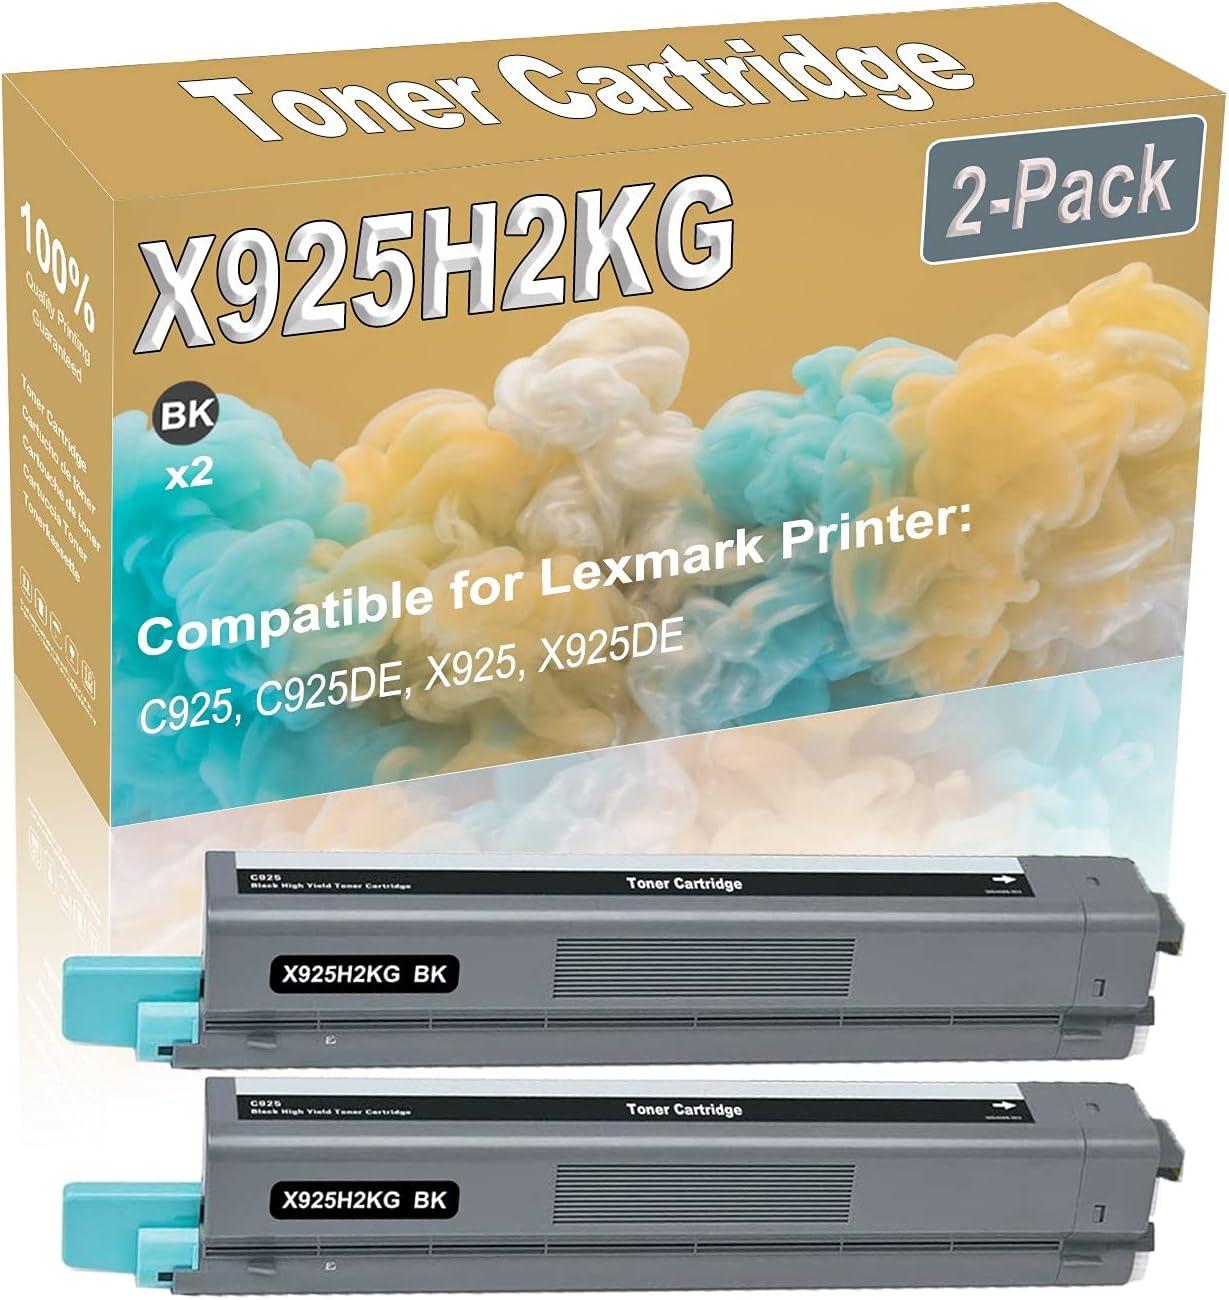 2-Pack (Black) Compatible C925 C925DE X925 X925DE Laser Toner Cartridge (High Capacity) Replacement for Lexmark X925H2KG Printer Toner Cartridge